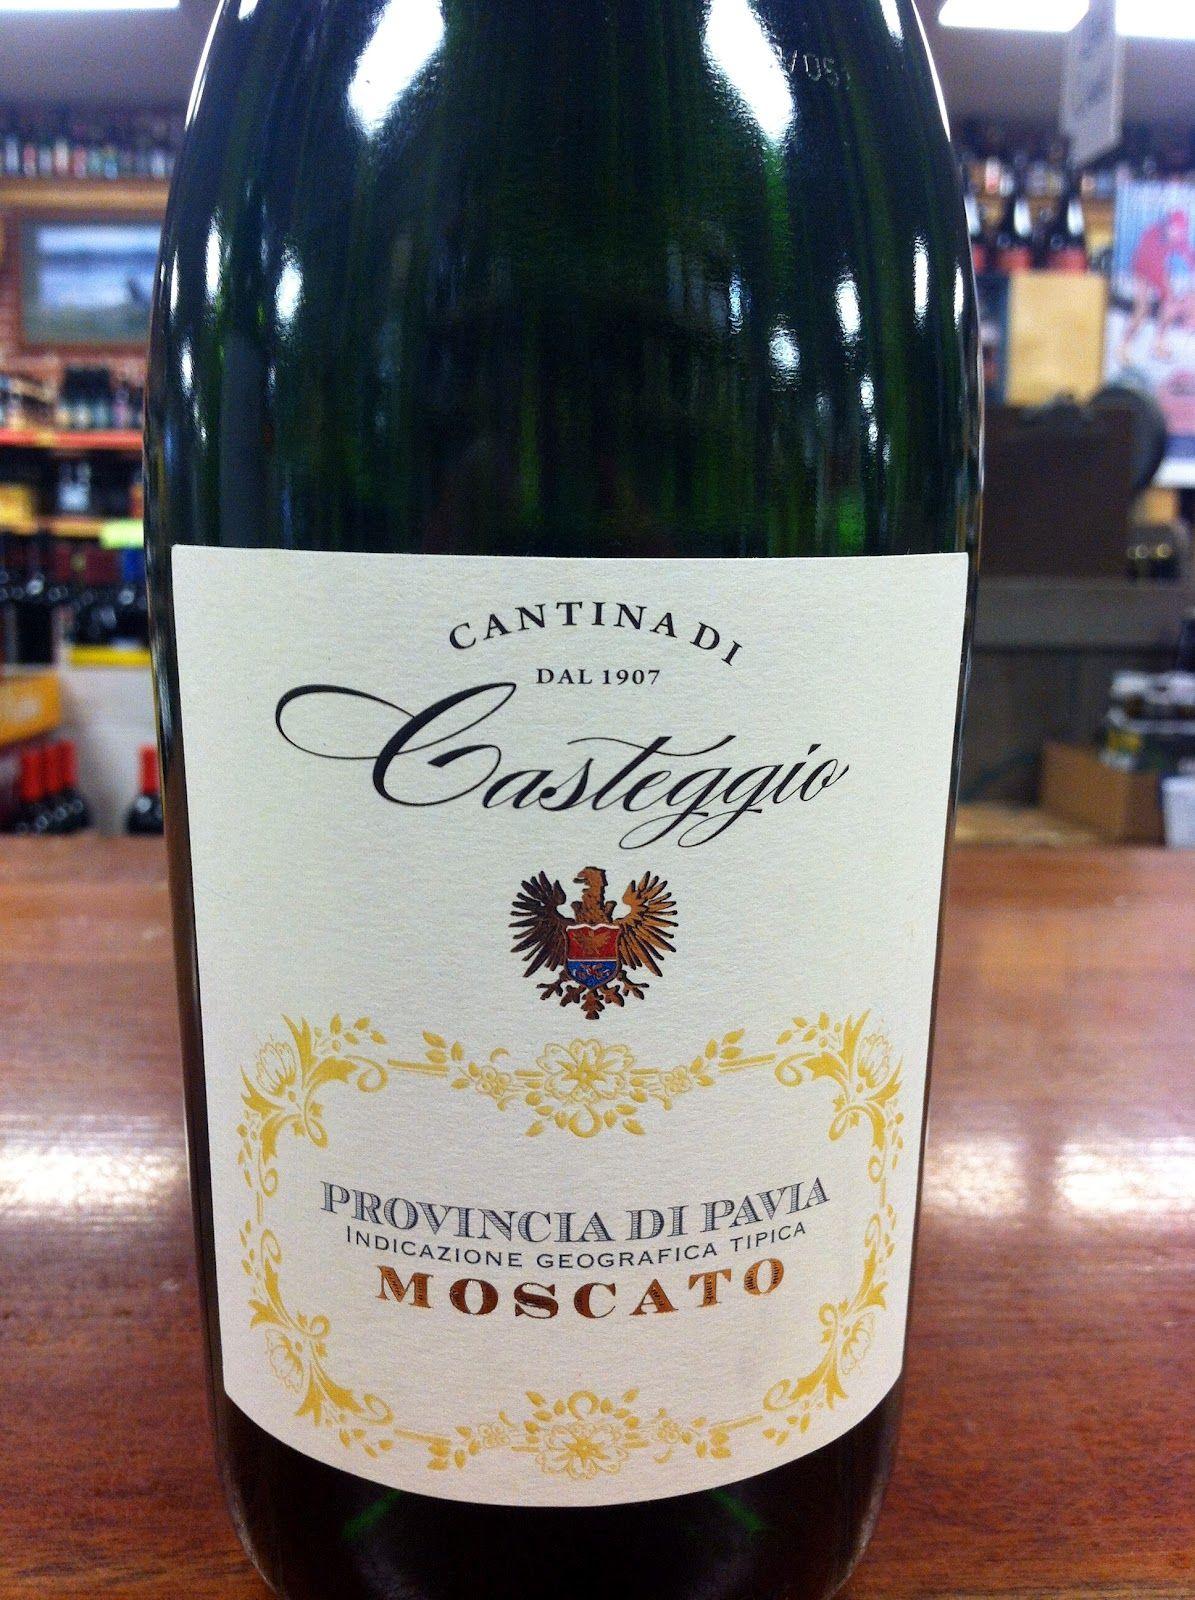 Casteggio moscato wine down wine and dine sweet wine